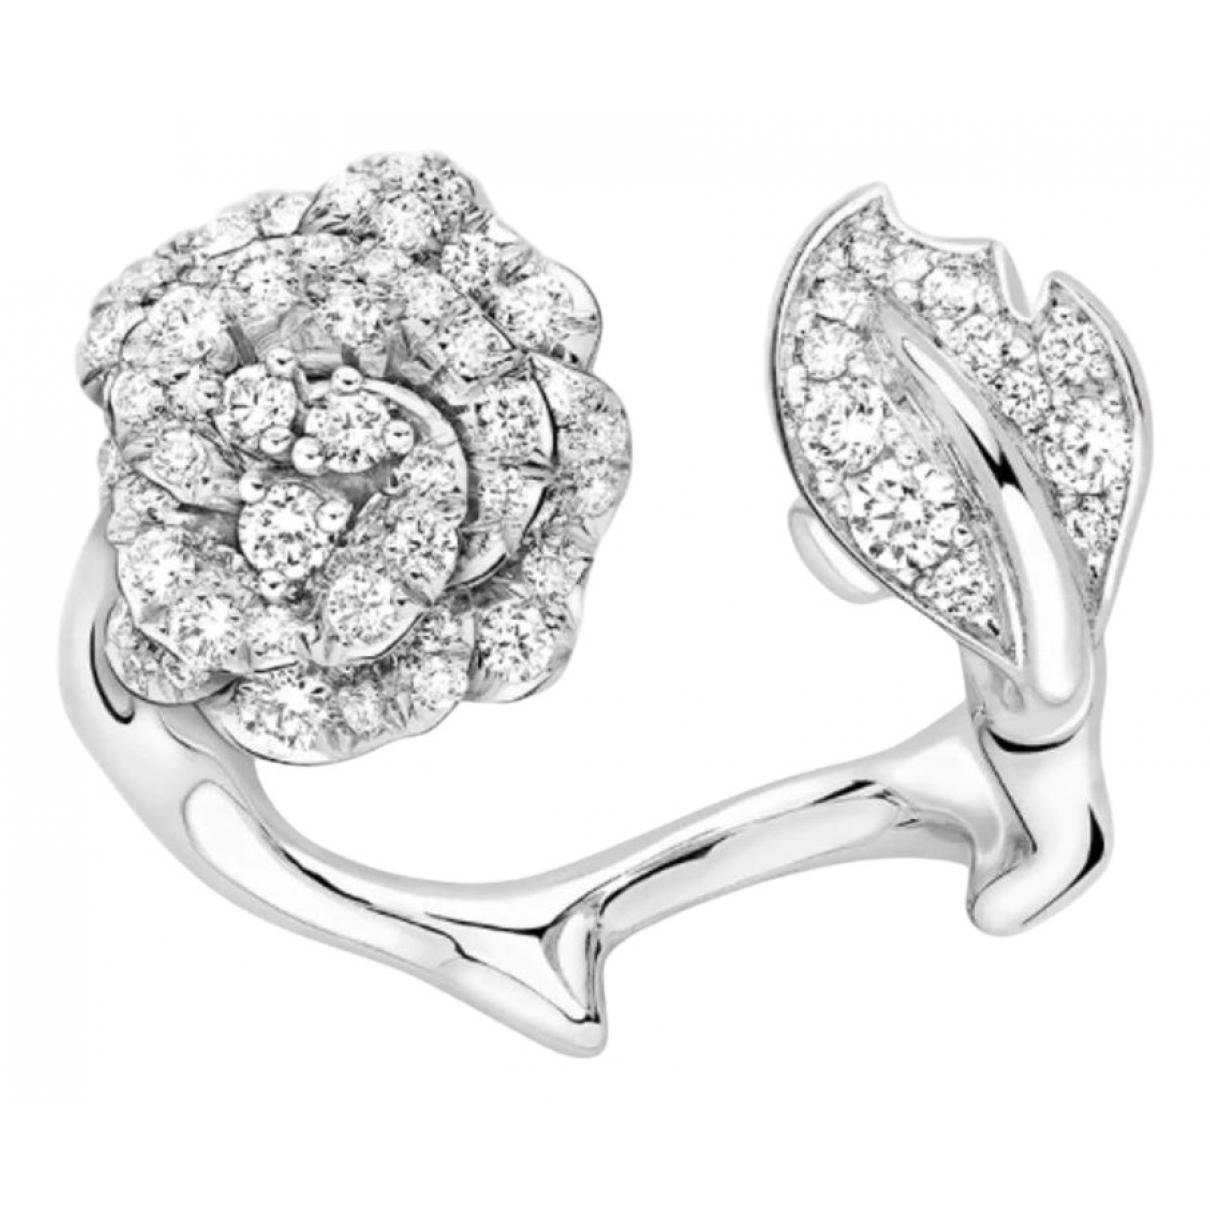 Dior Bois de Rose Ring in Weissgold